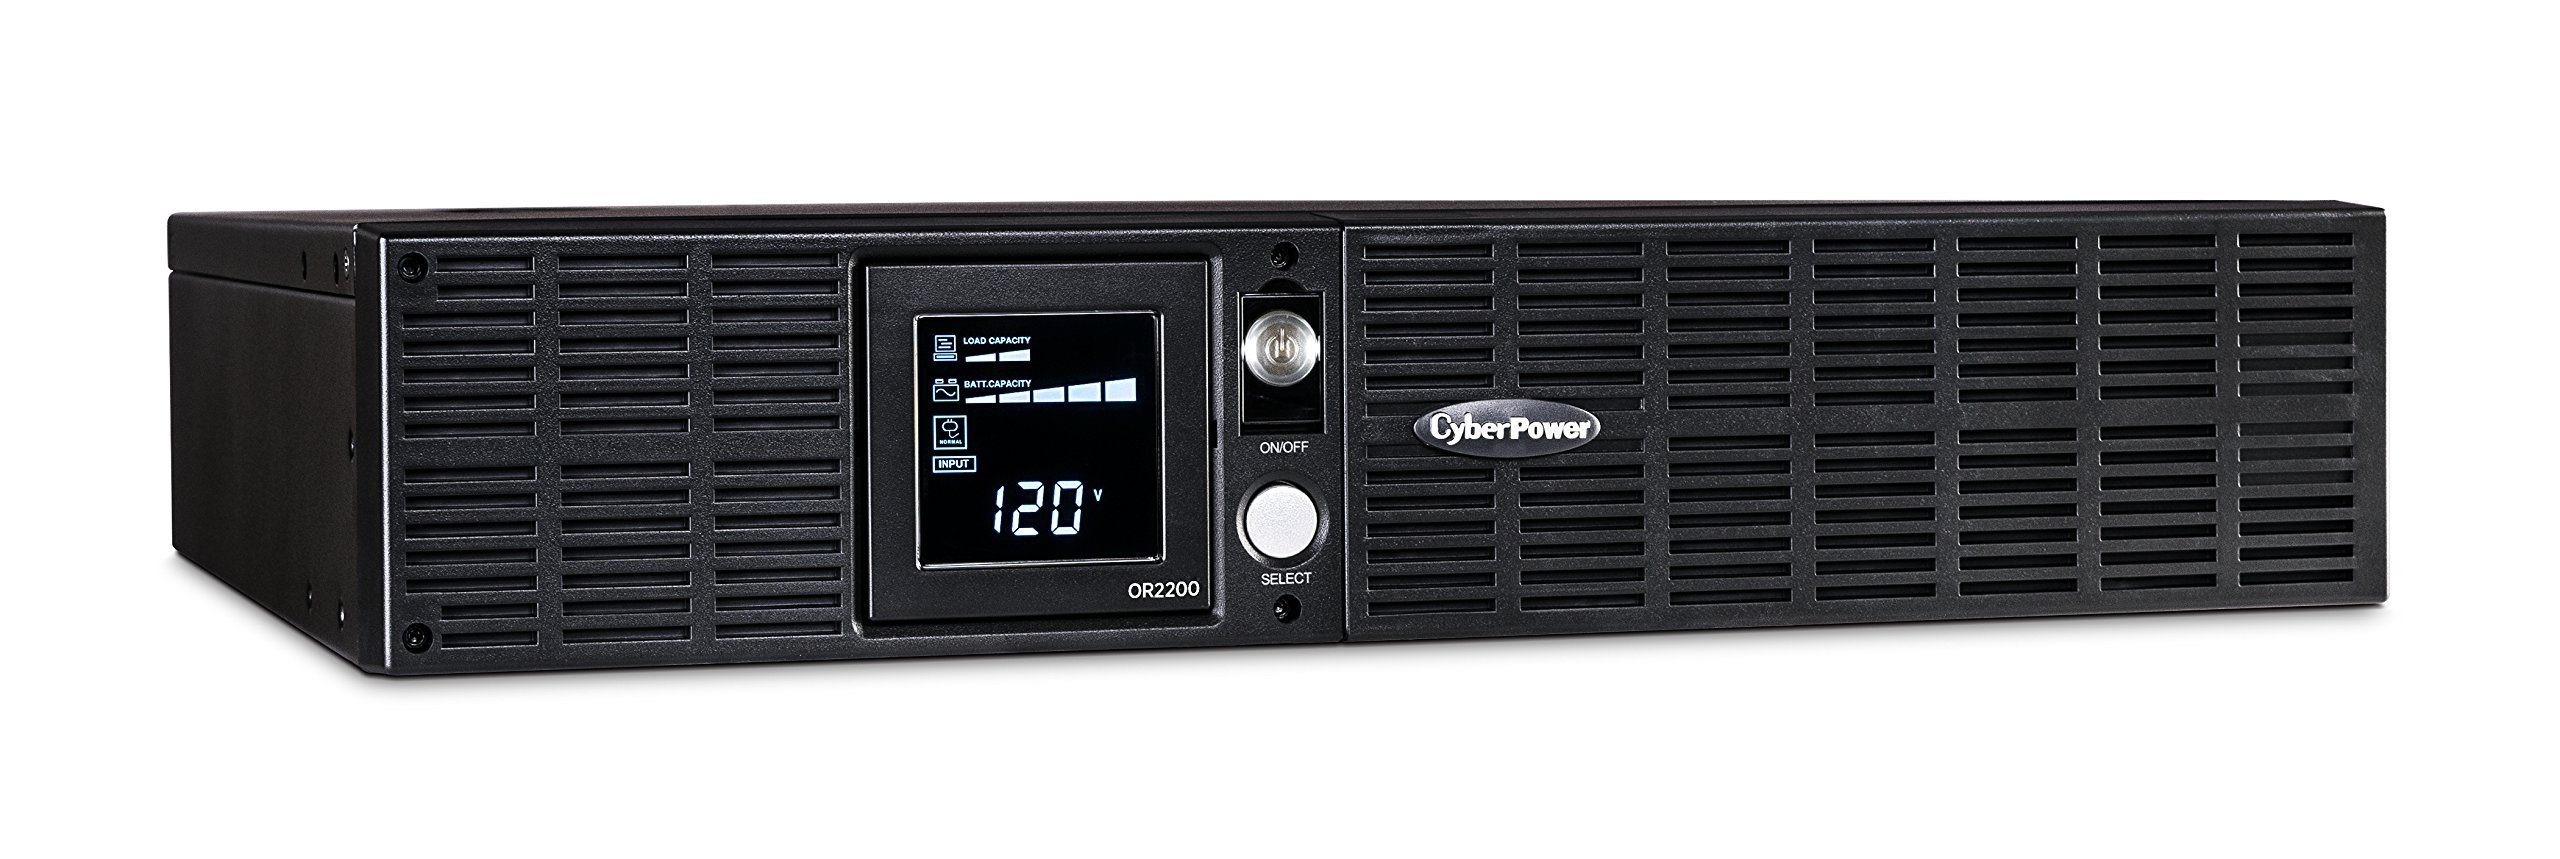 CyberPower OR2200LCDRT2U Smart App LCD UPS System, 2200VA/1320W, 8 Outlets, AVR, 2U Rack/Tower